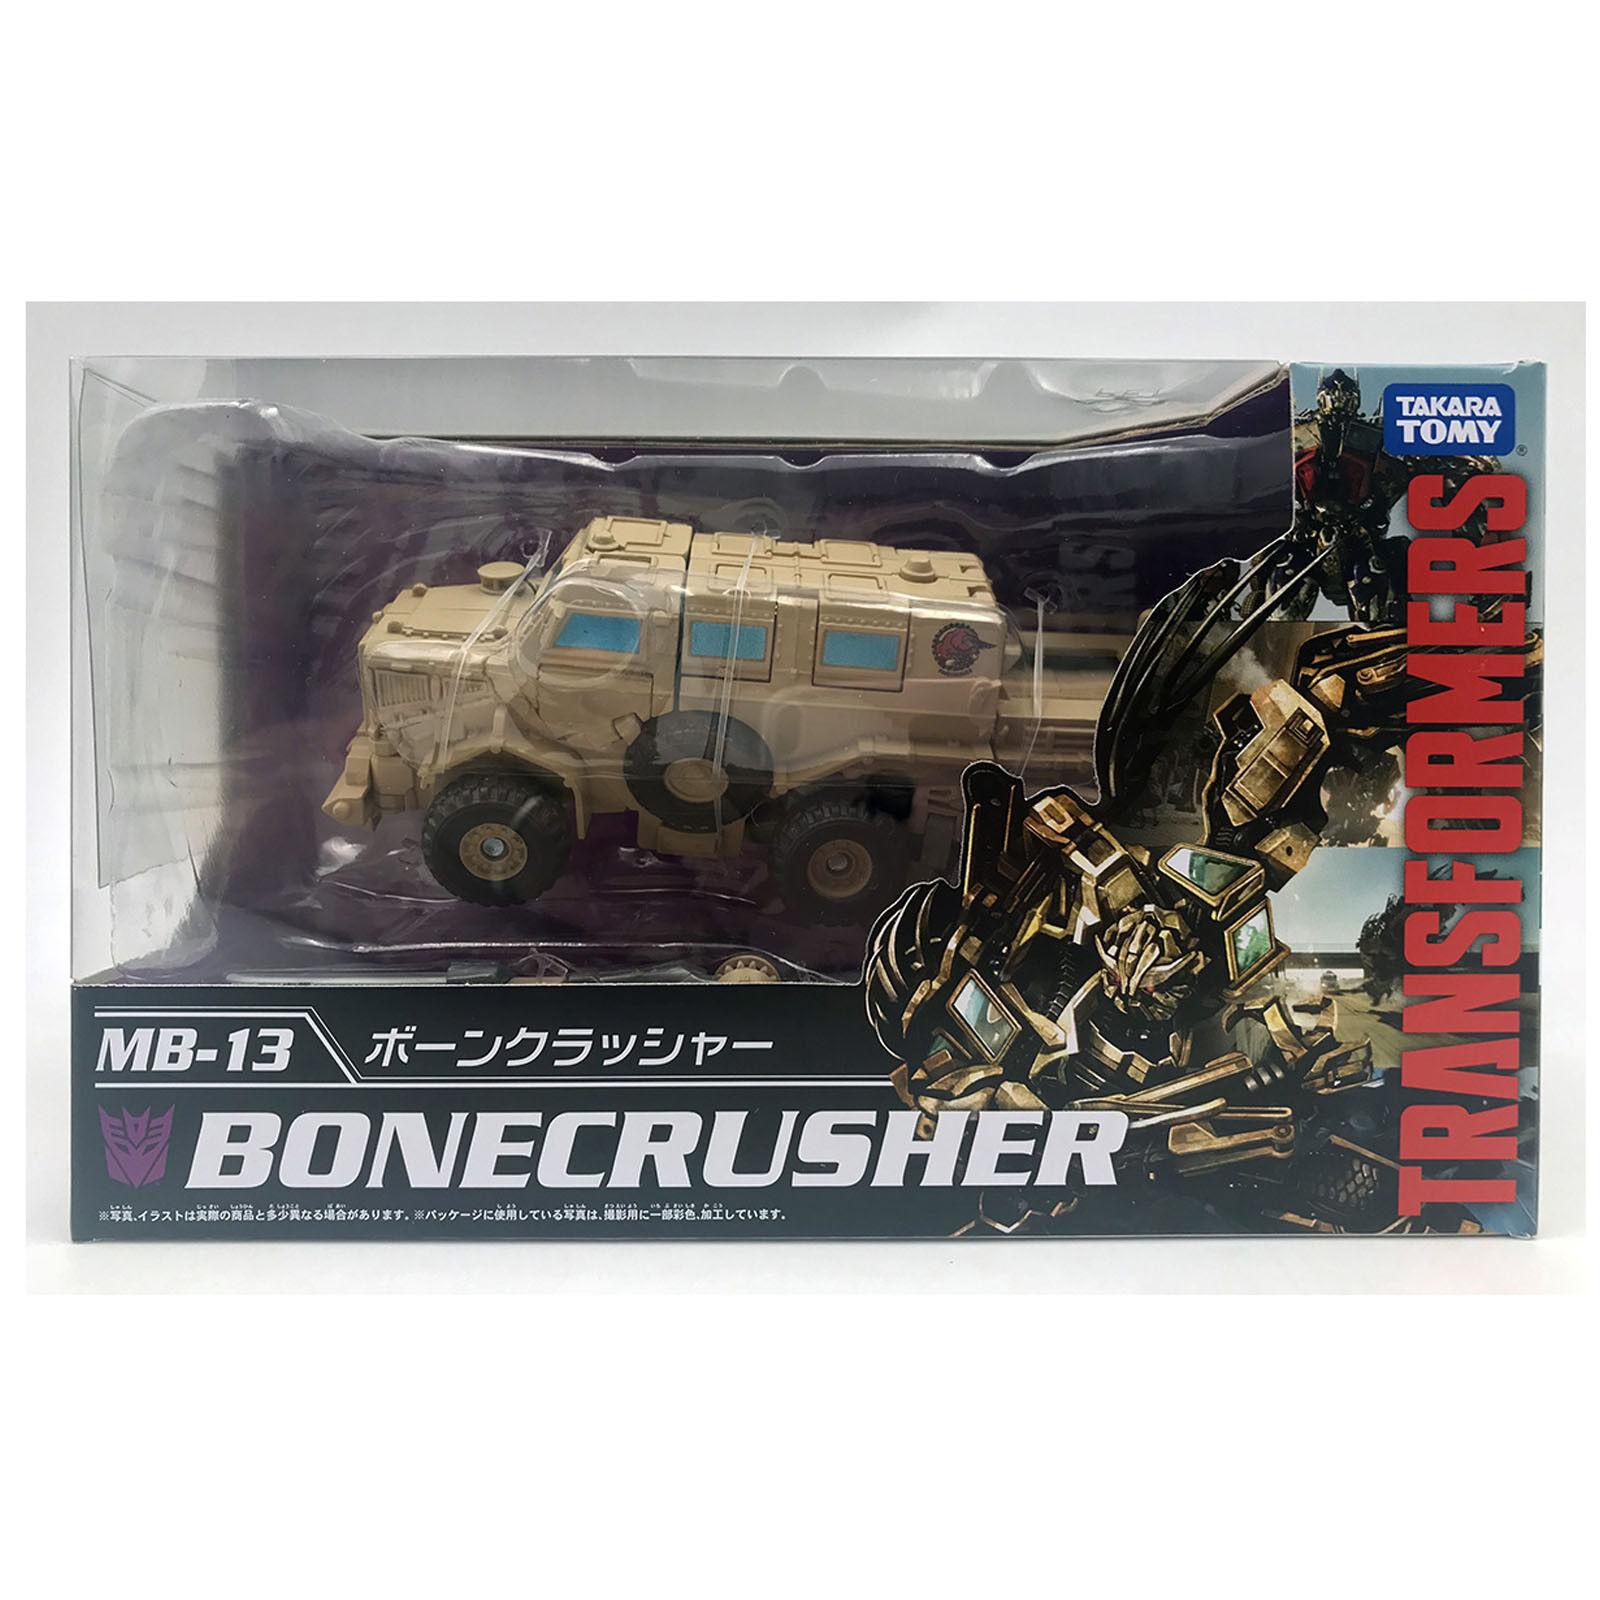 Transformers Film The Best MB-13 MB13 BONECRUSHER D Class Action Figure Cadeau